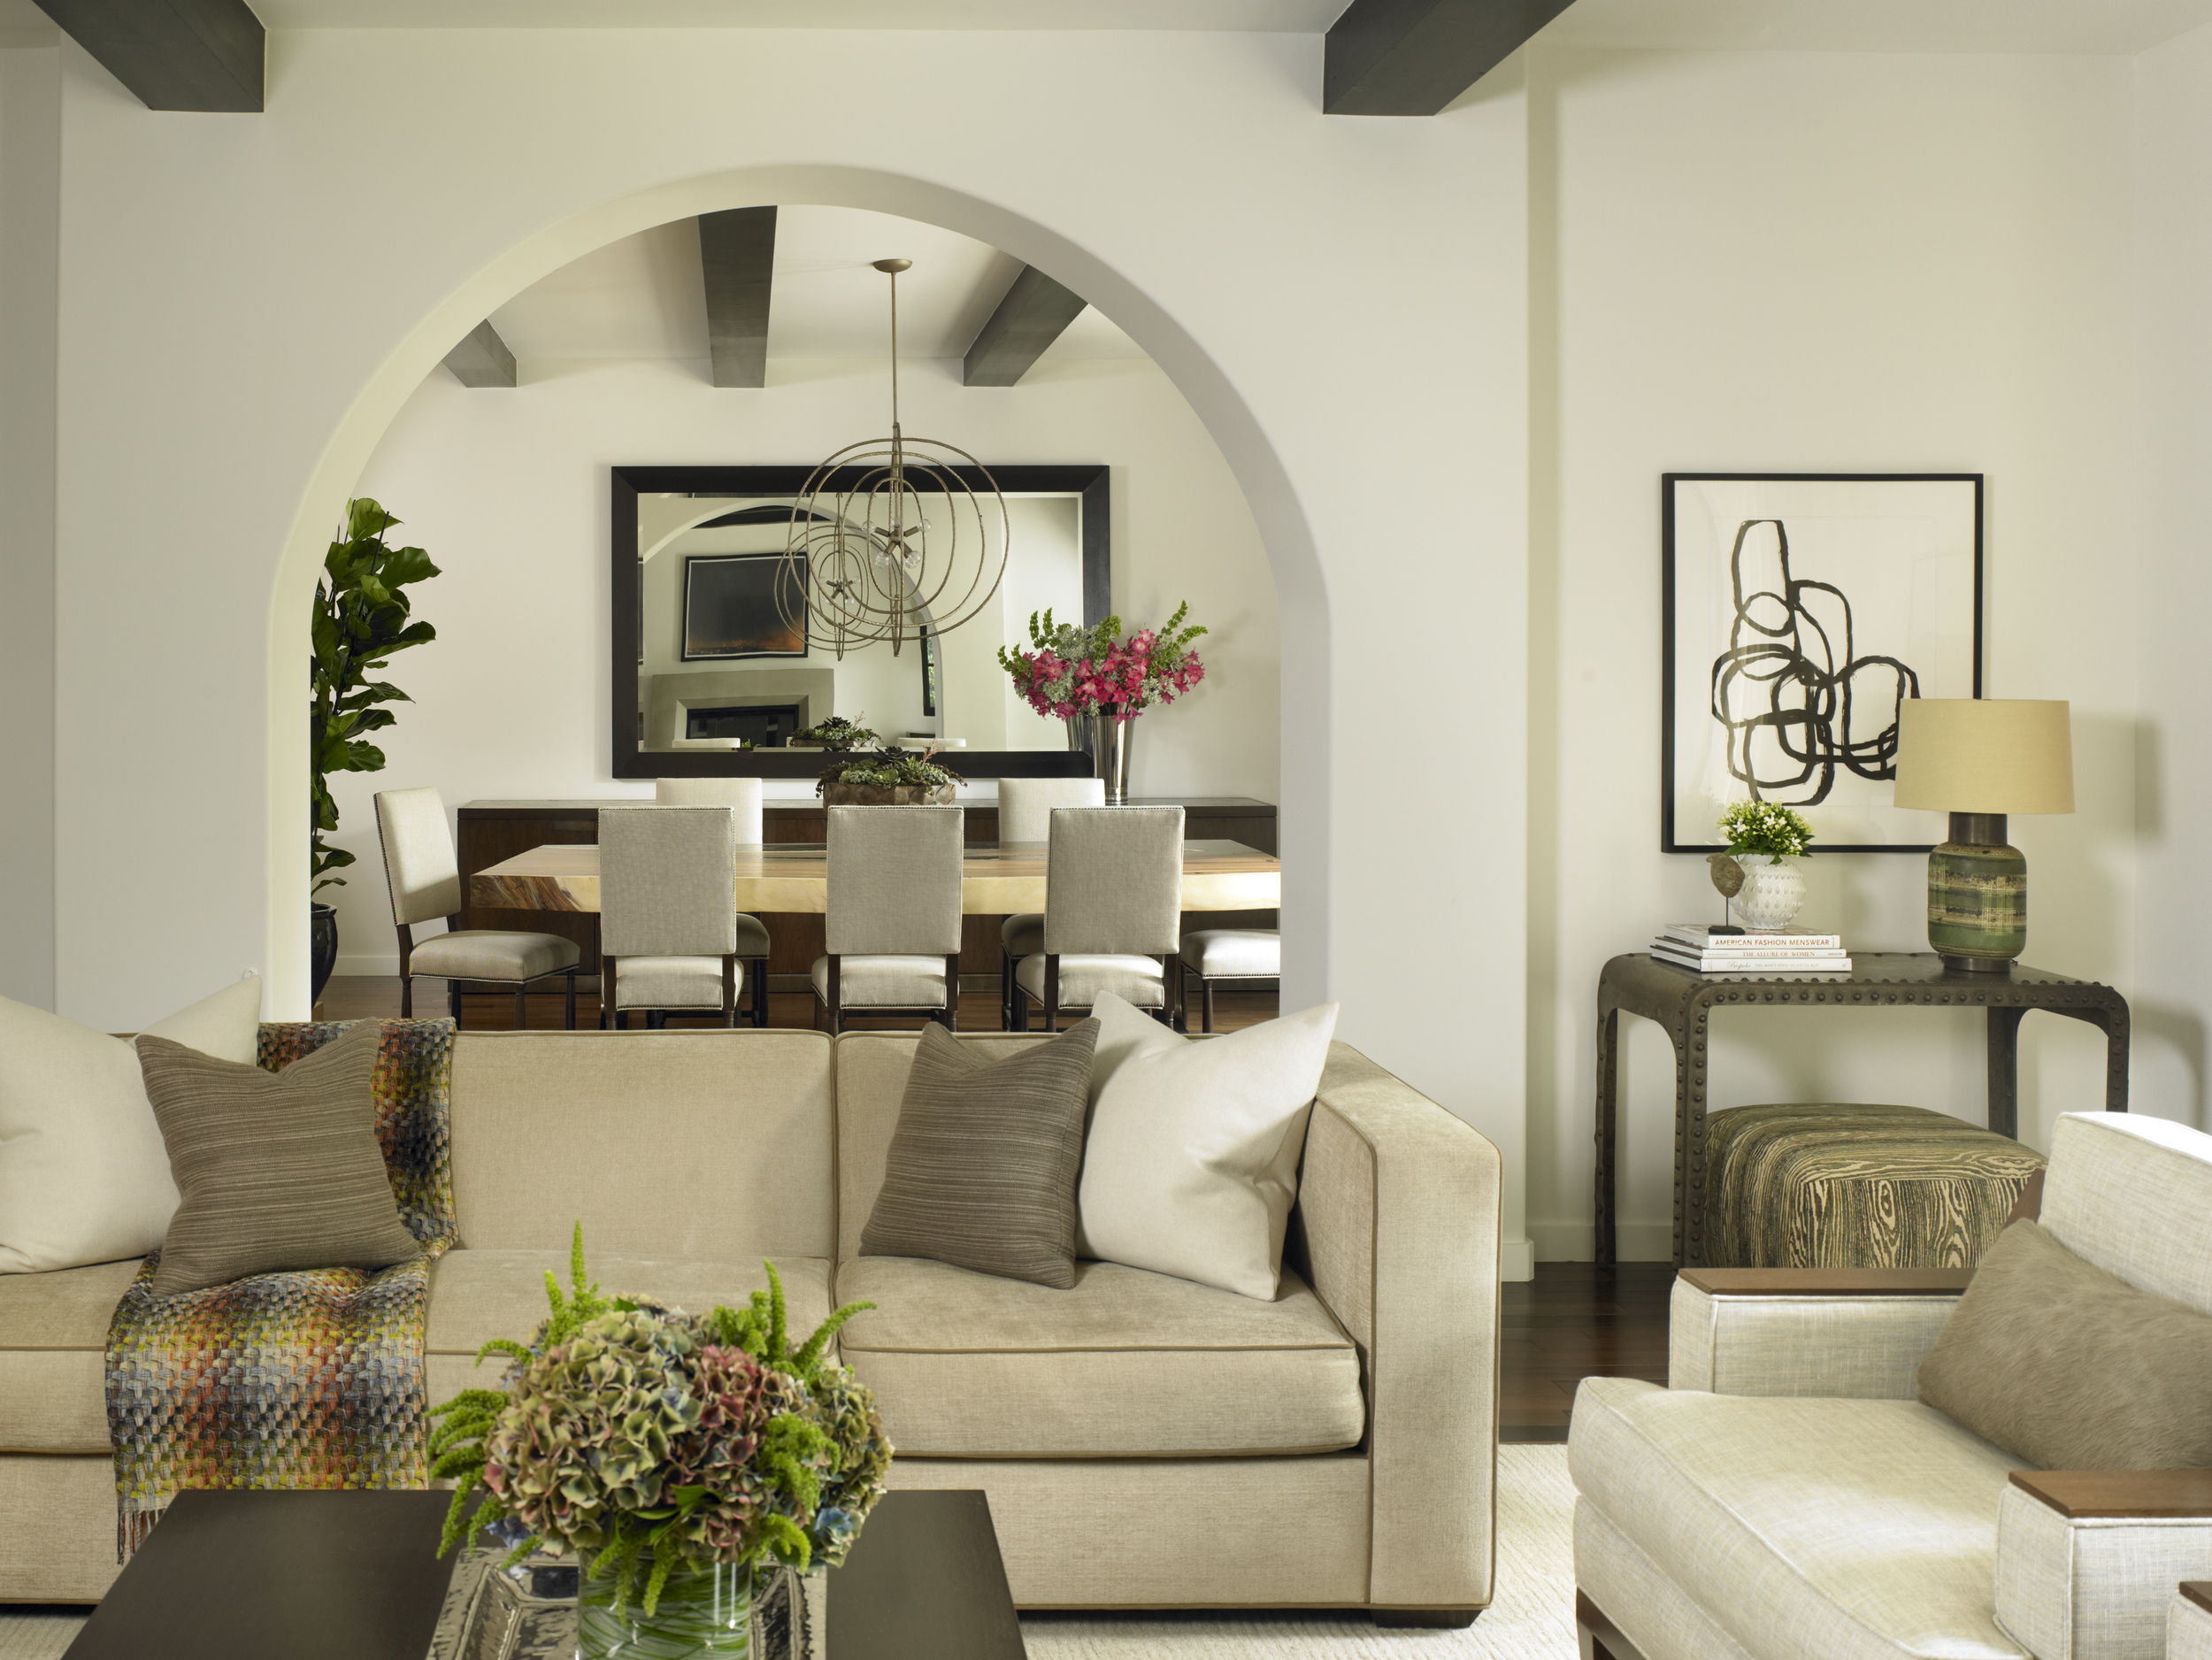 Kadlec Architecture + Design - West Hollywood Bungalow 6.jpg